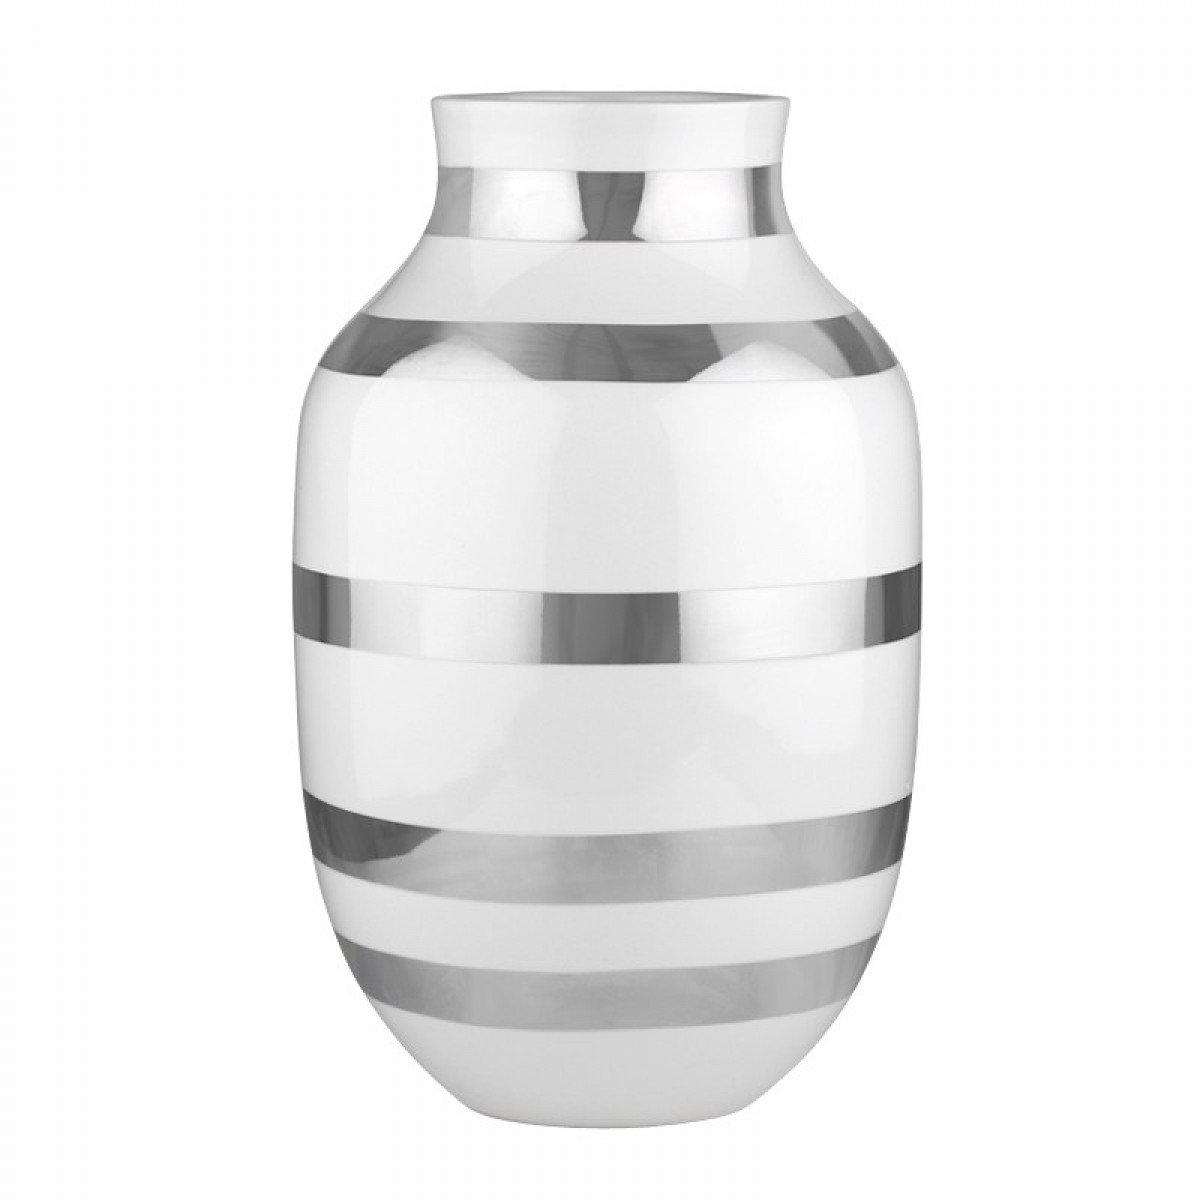 KÄHLER Omaggio vase sølv 30,5 cm.